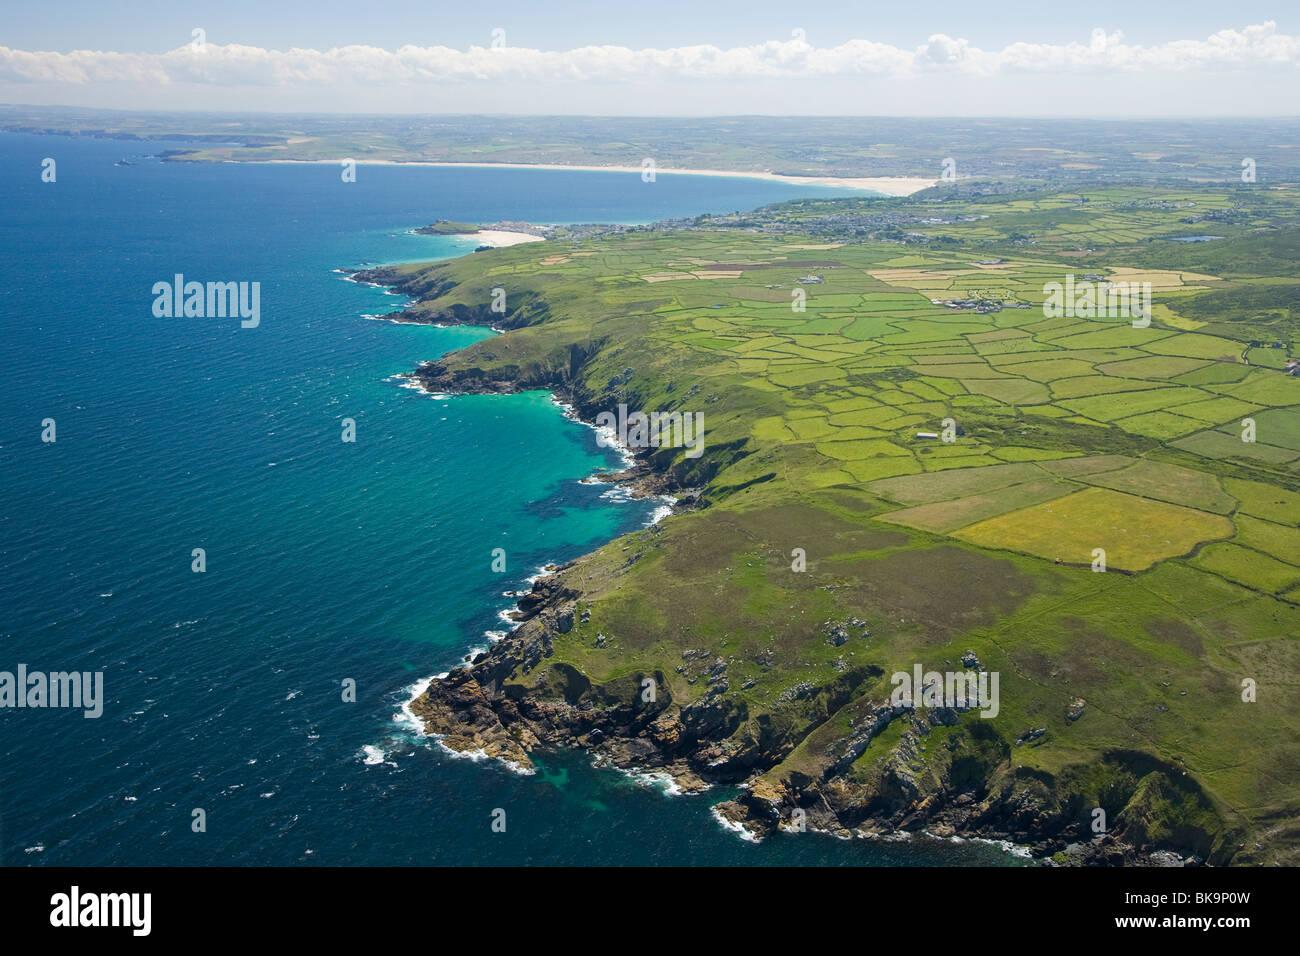 St Ives coastline, Lands End Peninsula, Cornwall, United Kingdom - Stock Image